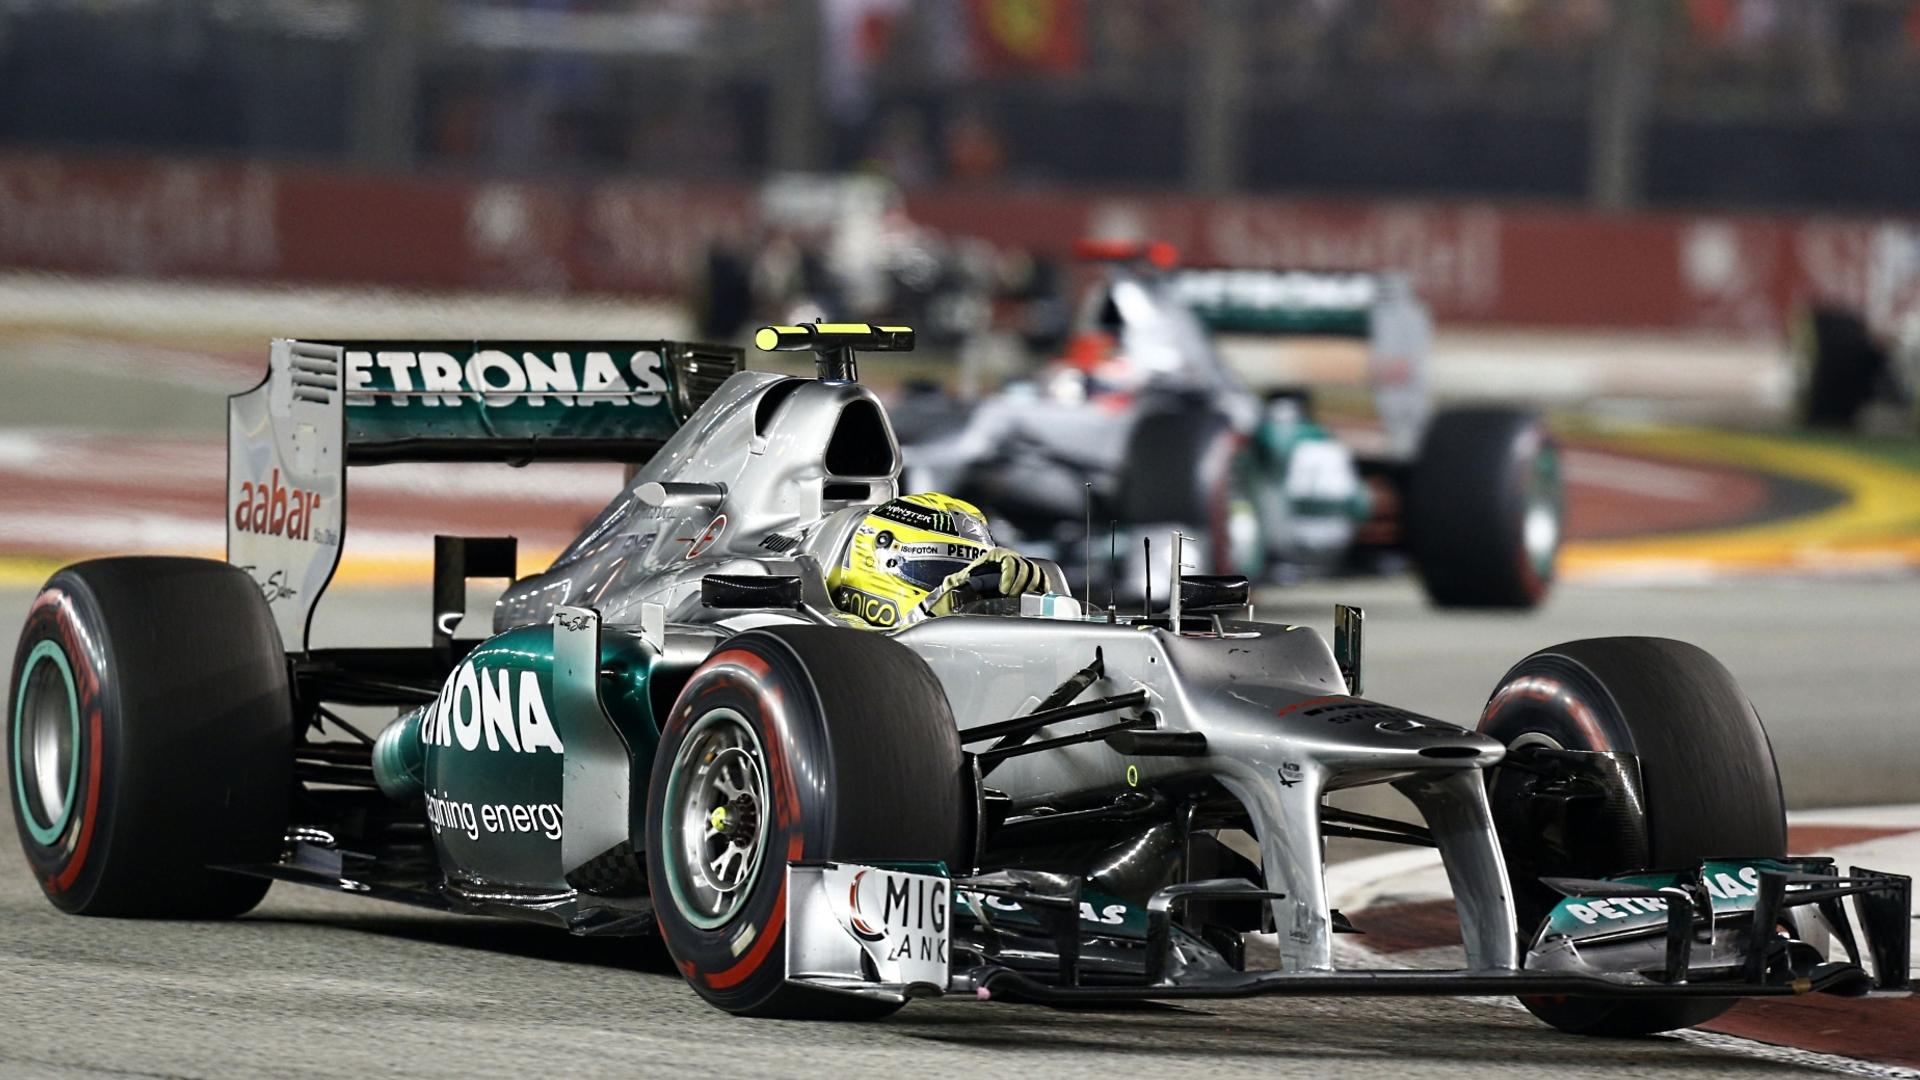 Wallpaper : 1920x1080 px, Formula 1, Mercedes AMG Petronas ...